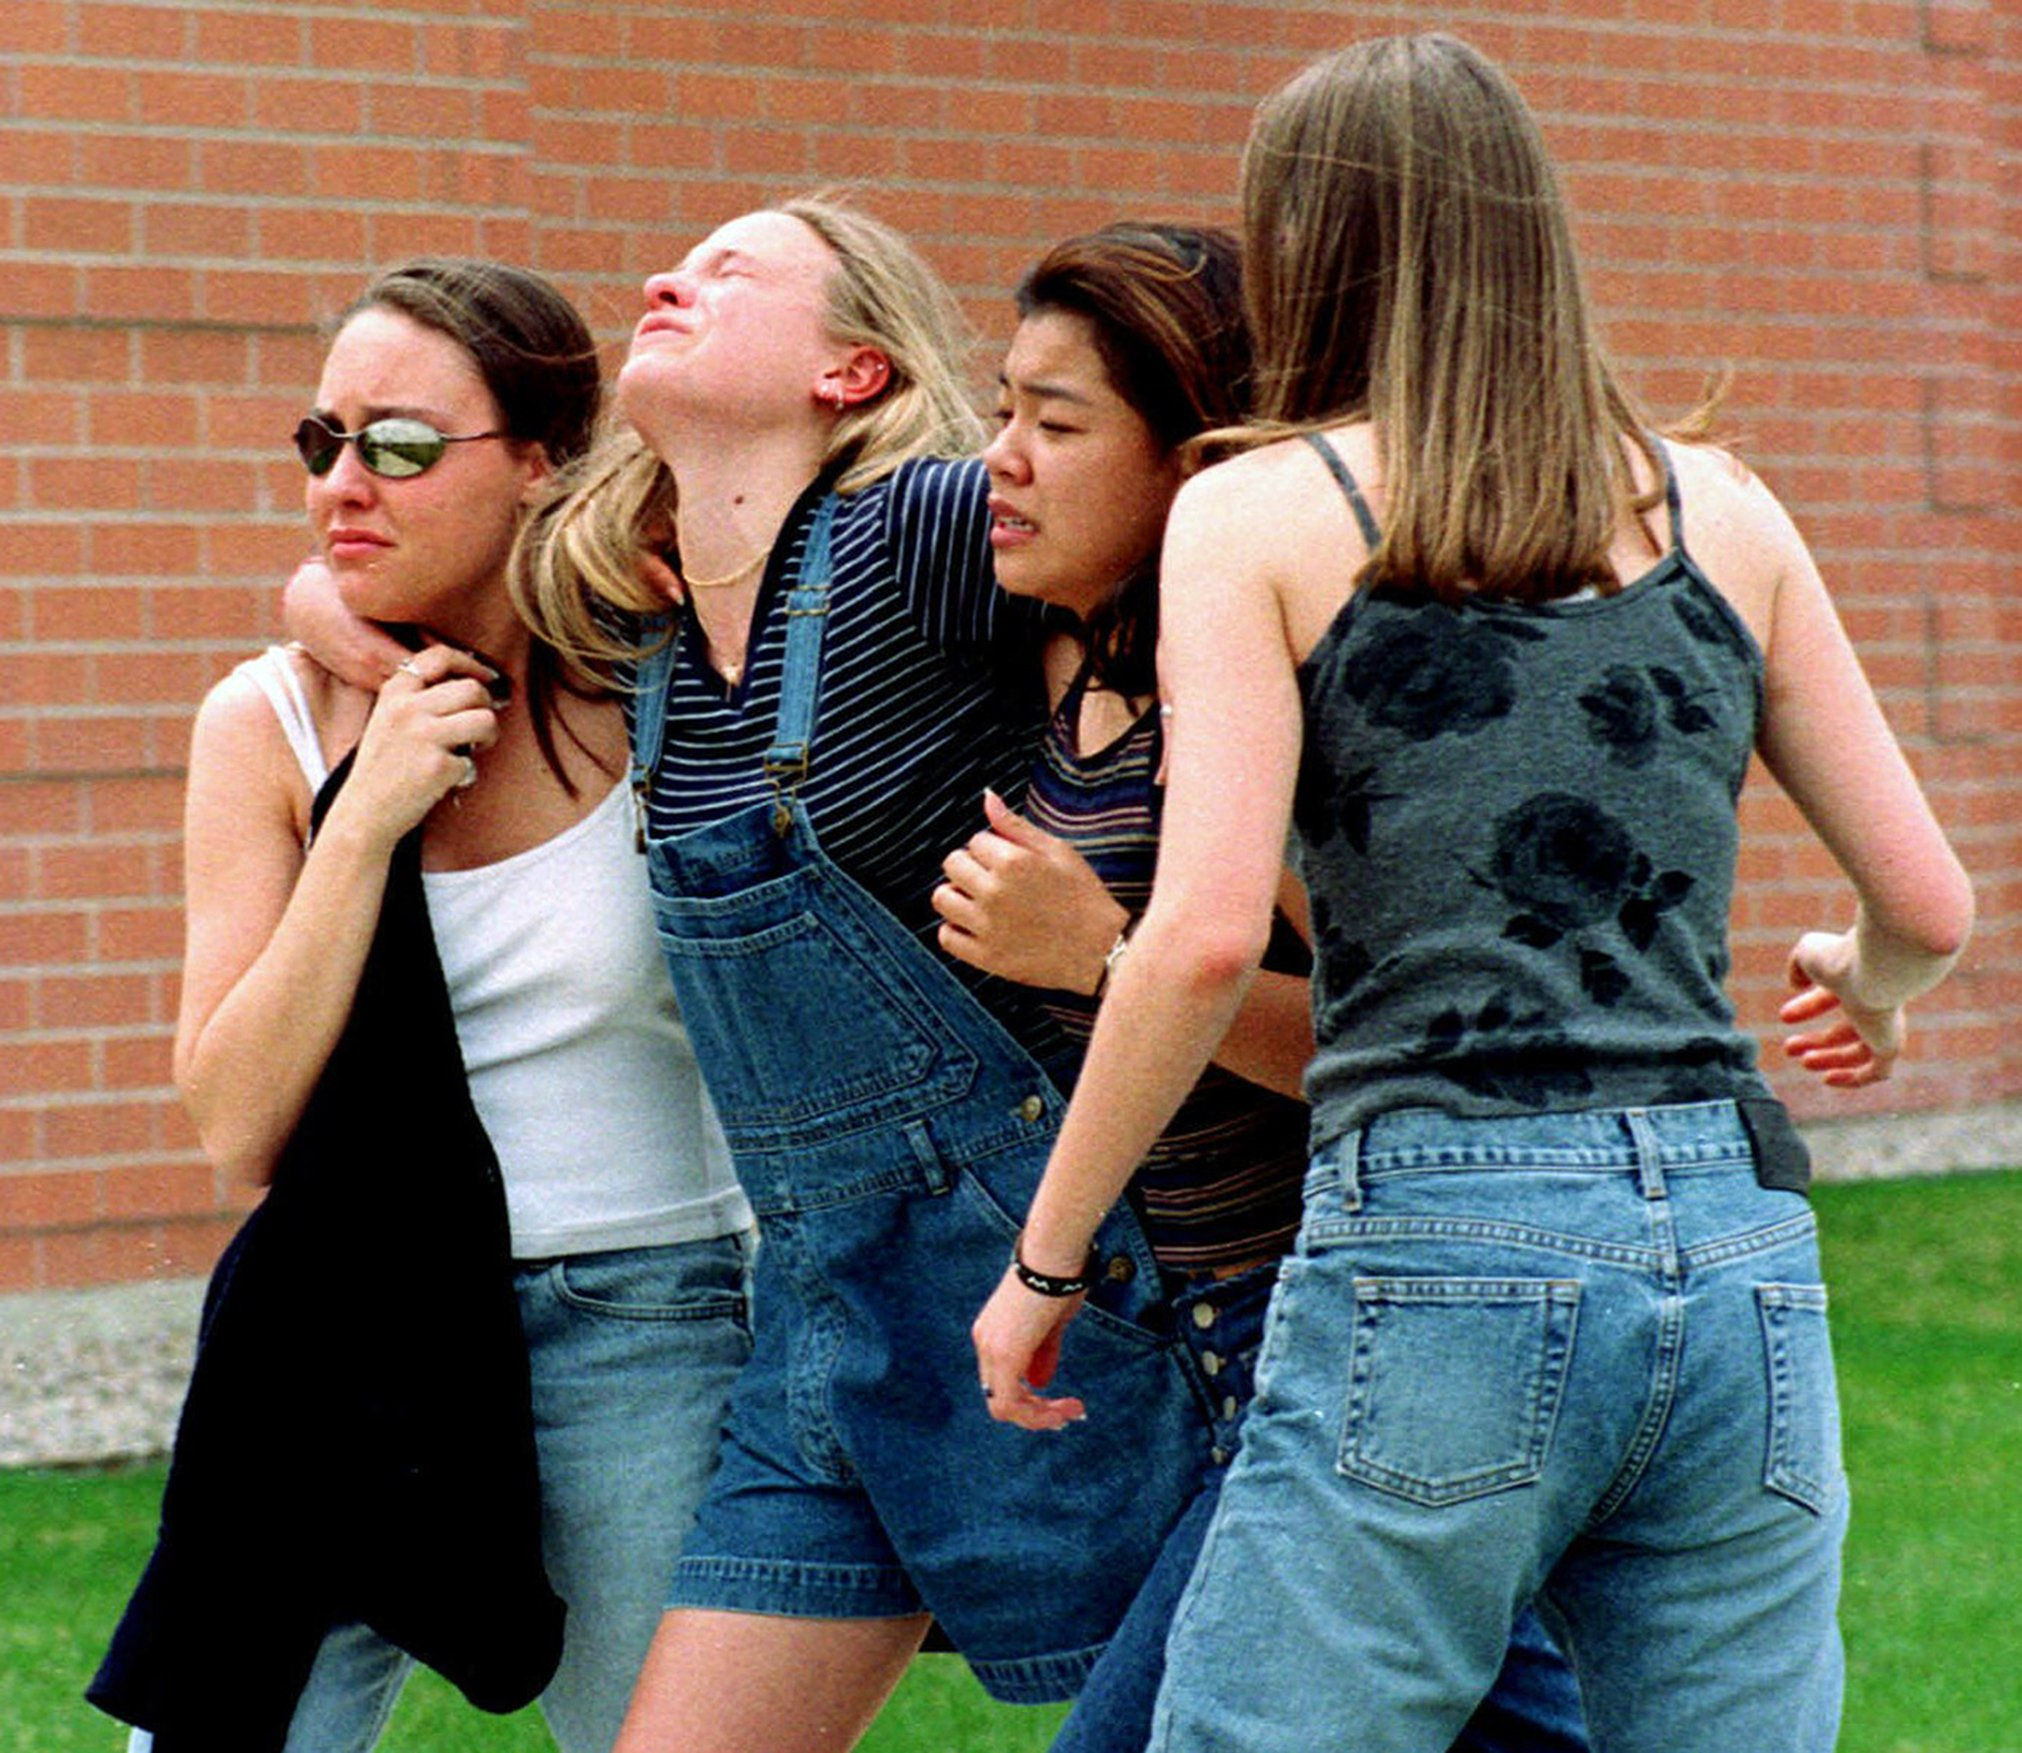 1000 Ideas About Columbine High School Shooting On: AP PHOTOS: Teen Gunmen Unleashed Horror At Columbine In 1999